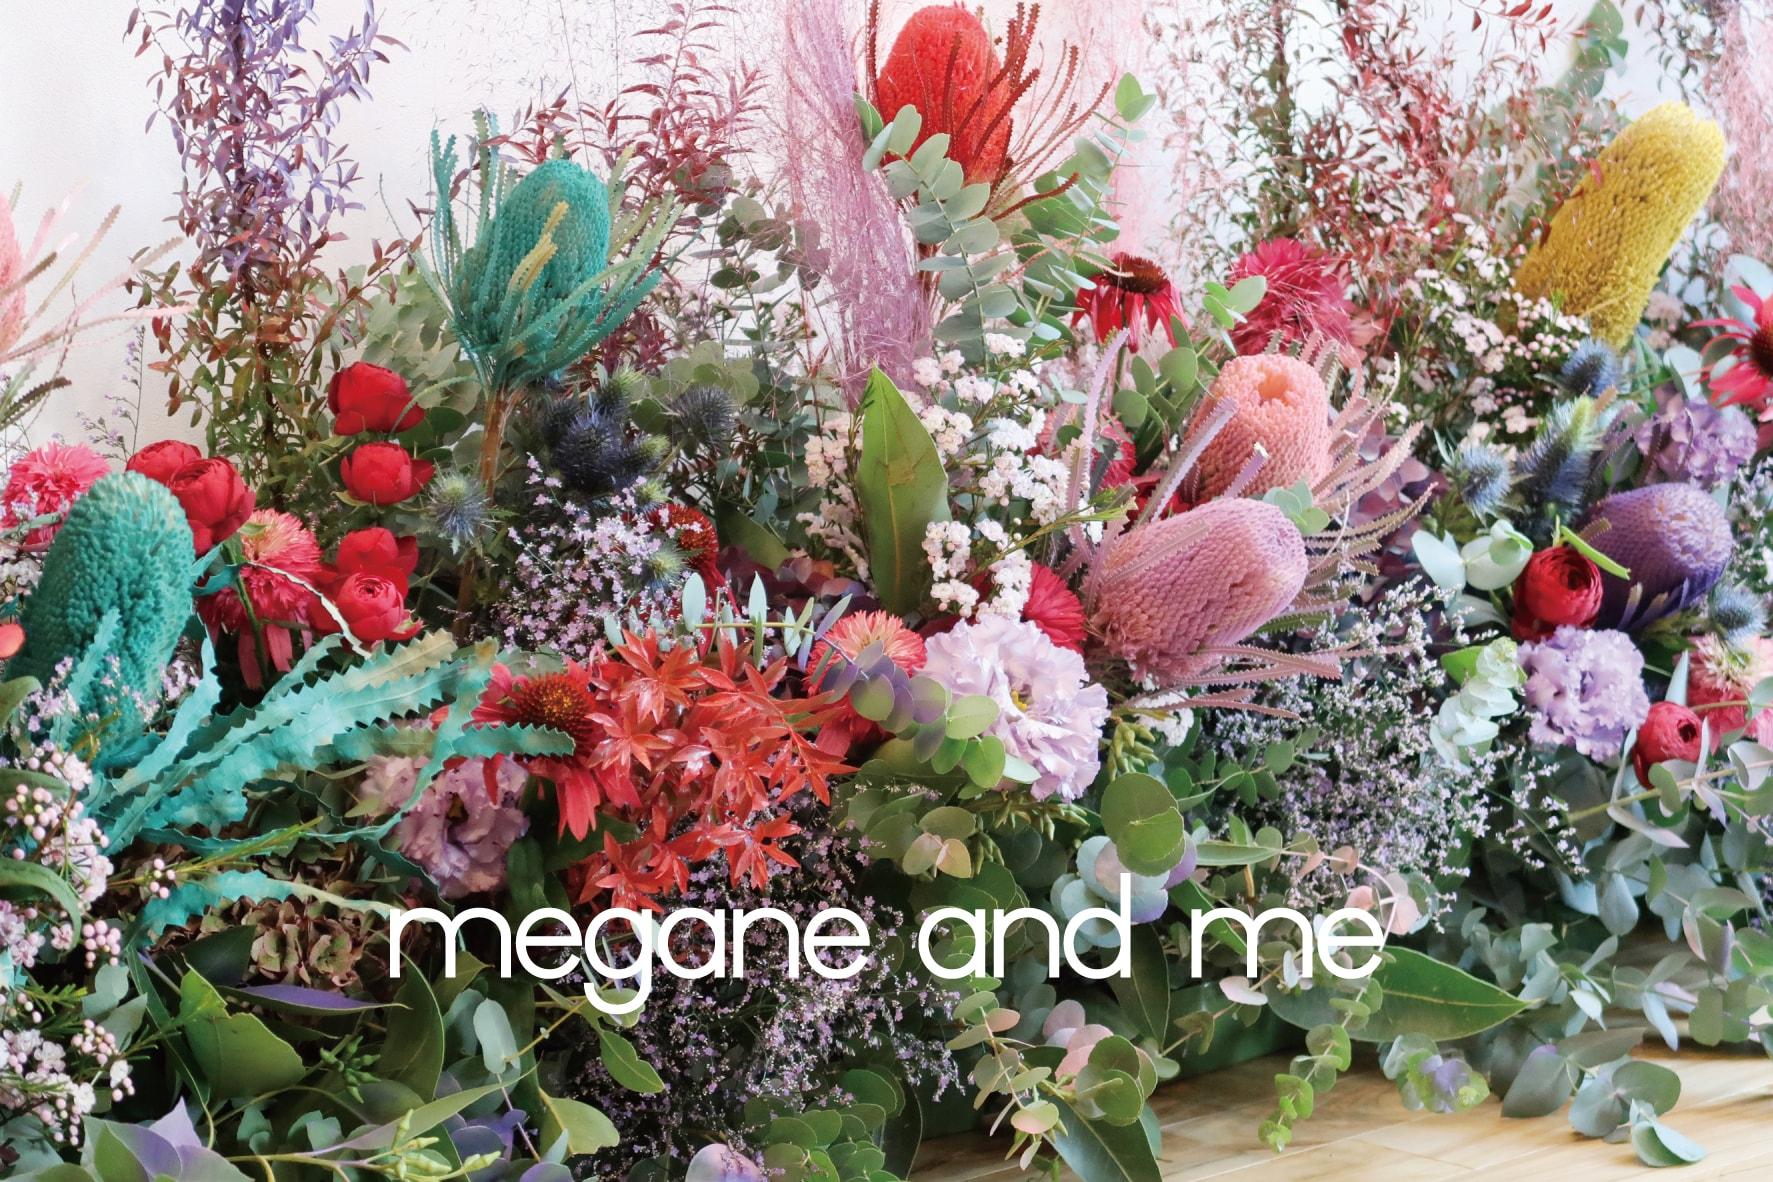 megane and me